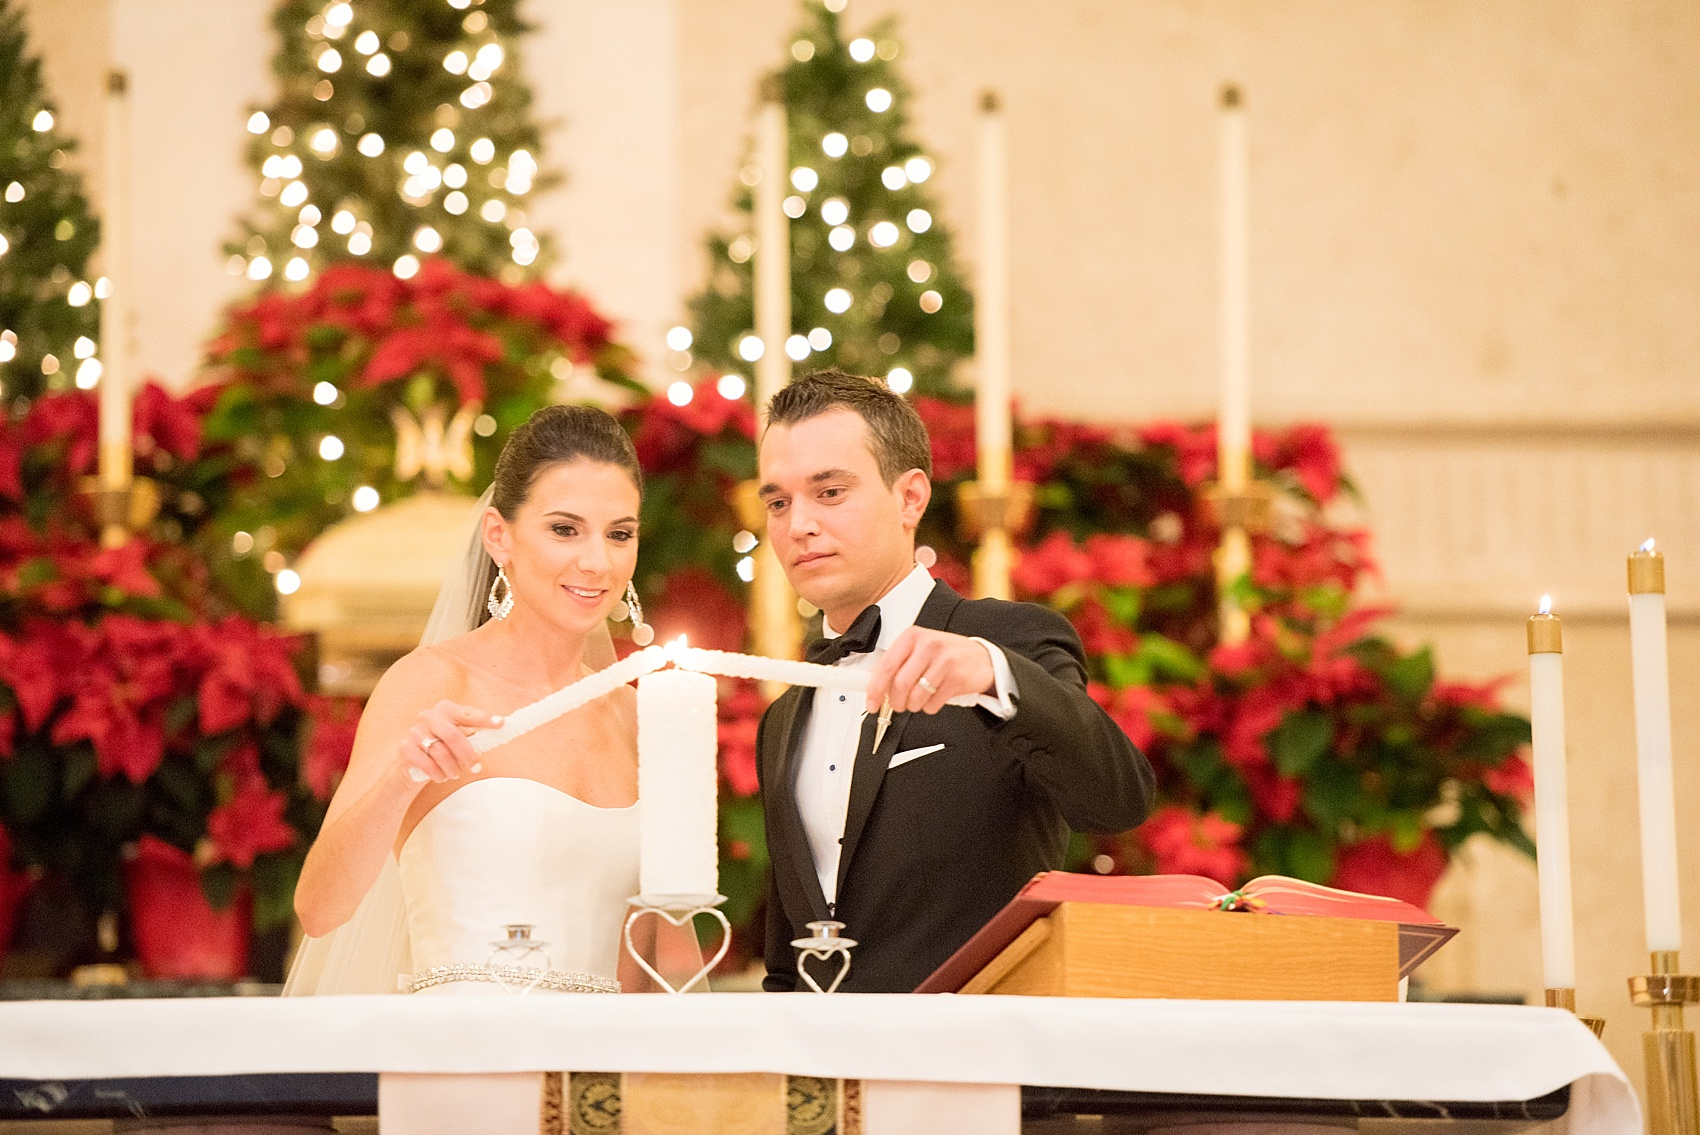 mikkelpaige-harbor_club_long_island-wedding_photographer-jen_dave_0016